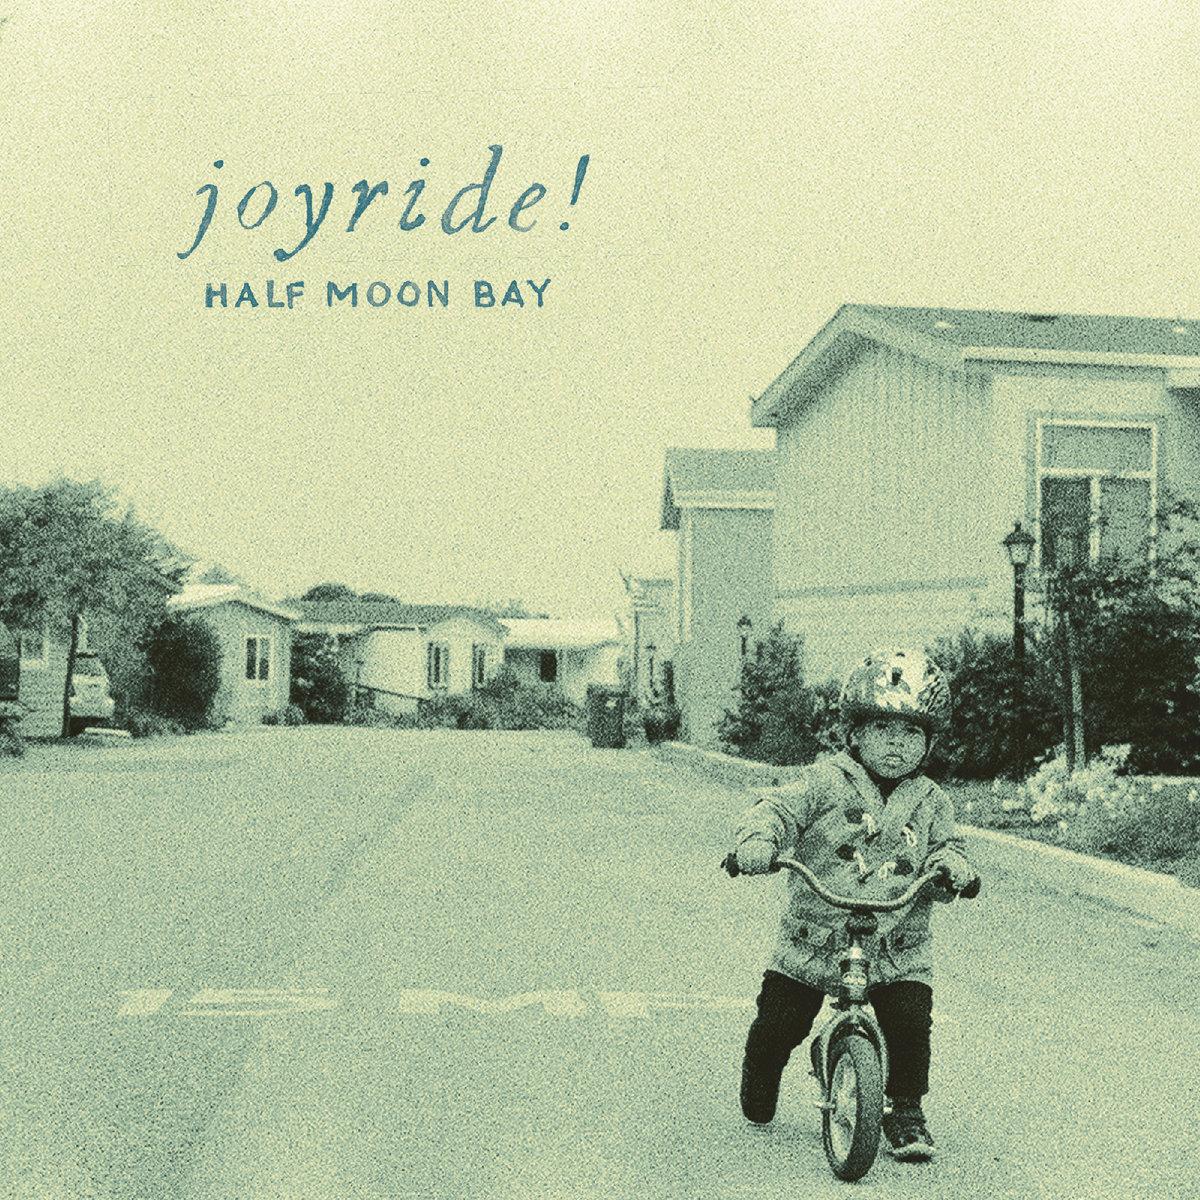 joyride! half moon bay cover art